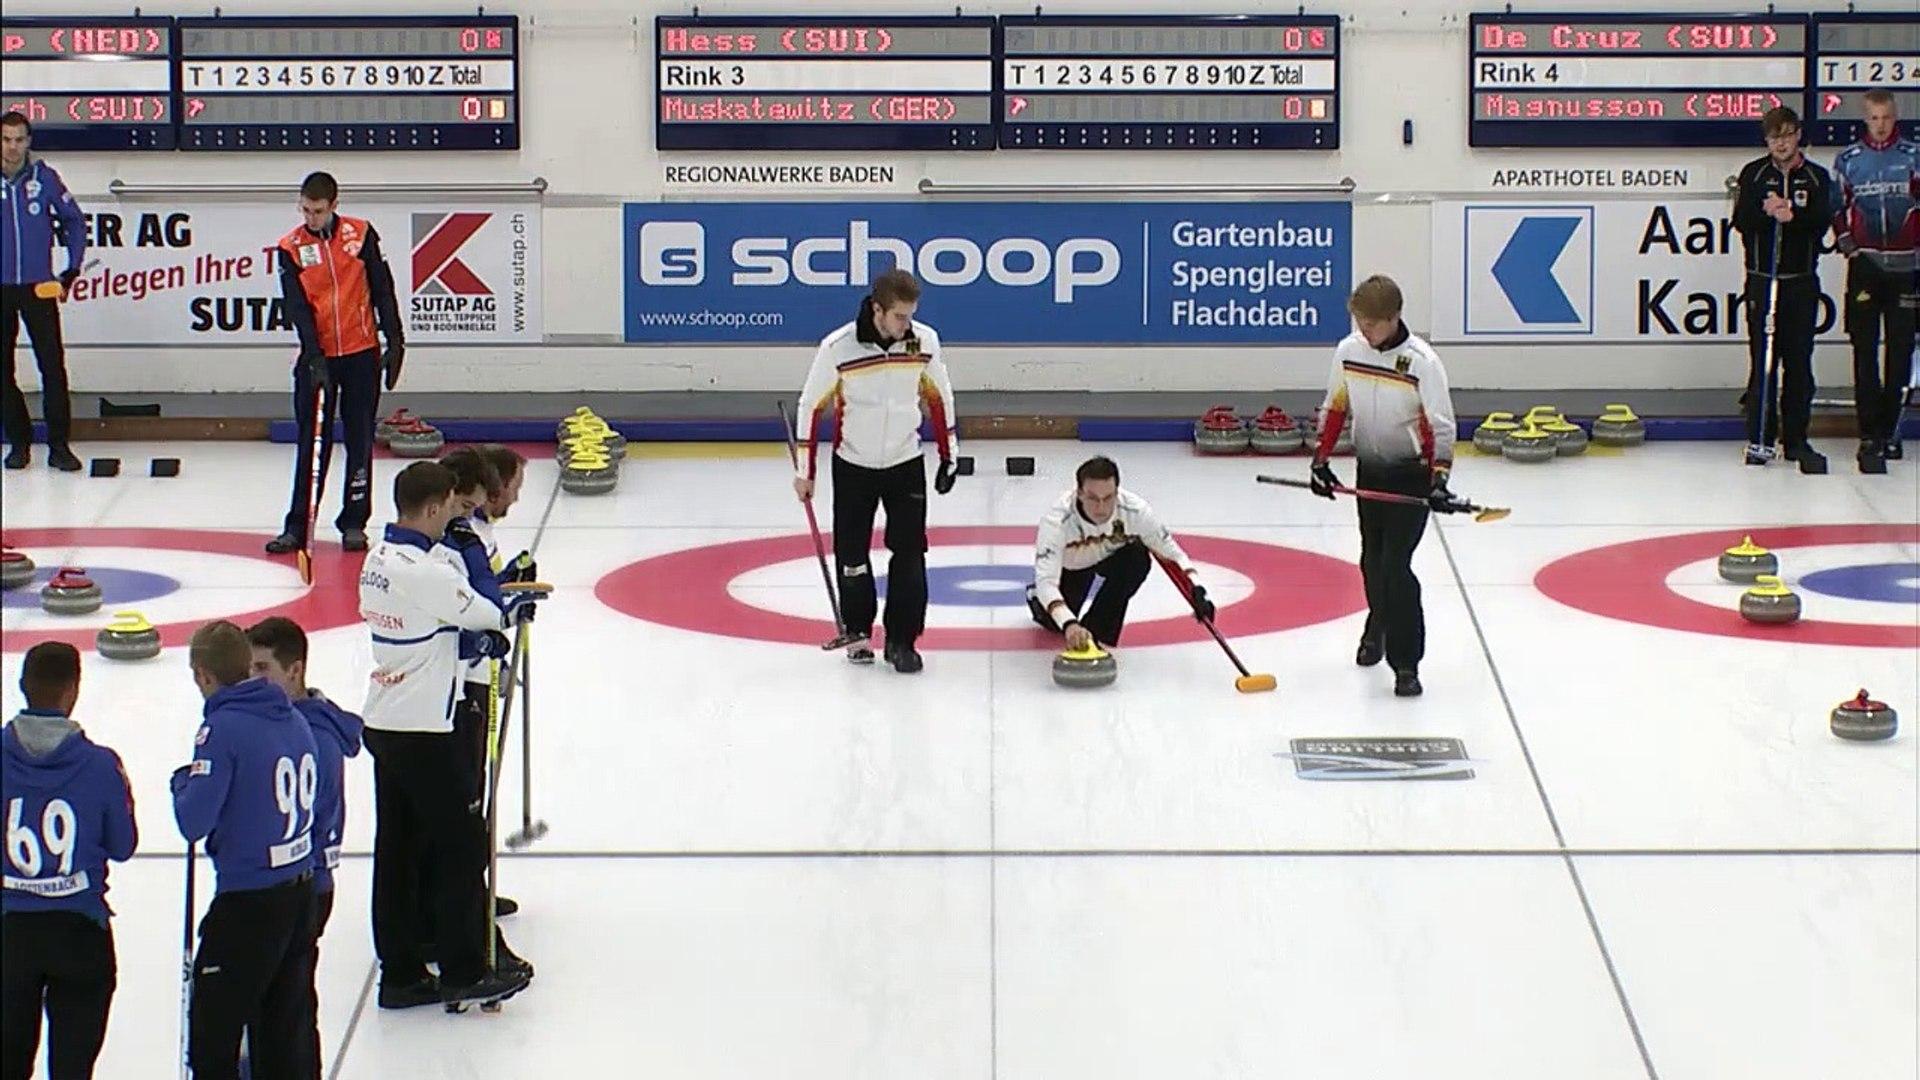 World Curling Tour, Baden Masters 2019, Team Hess (SUI) vs Team Muskatewitz (GER)